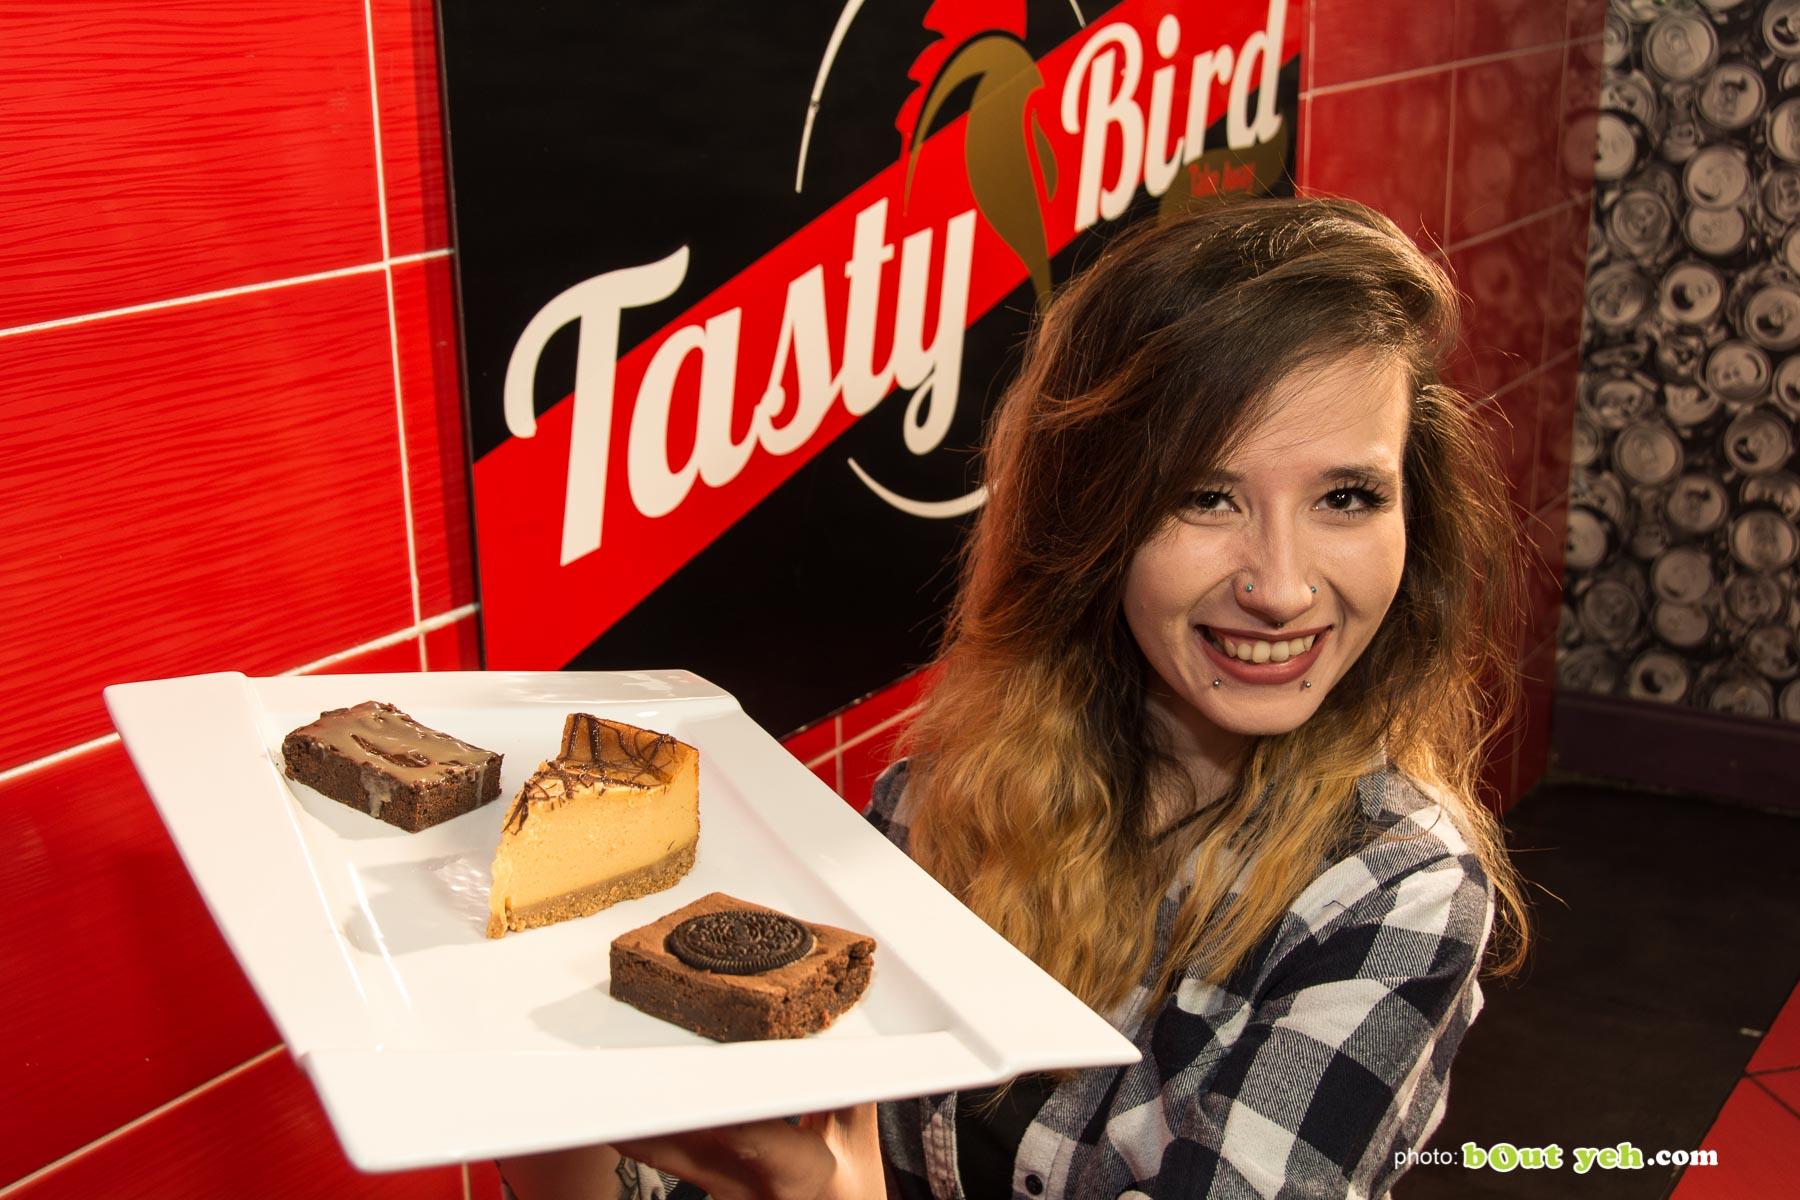 Food photographers Belfast portfolio photo 6083 - vegan desserts